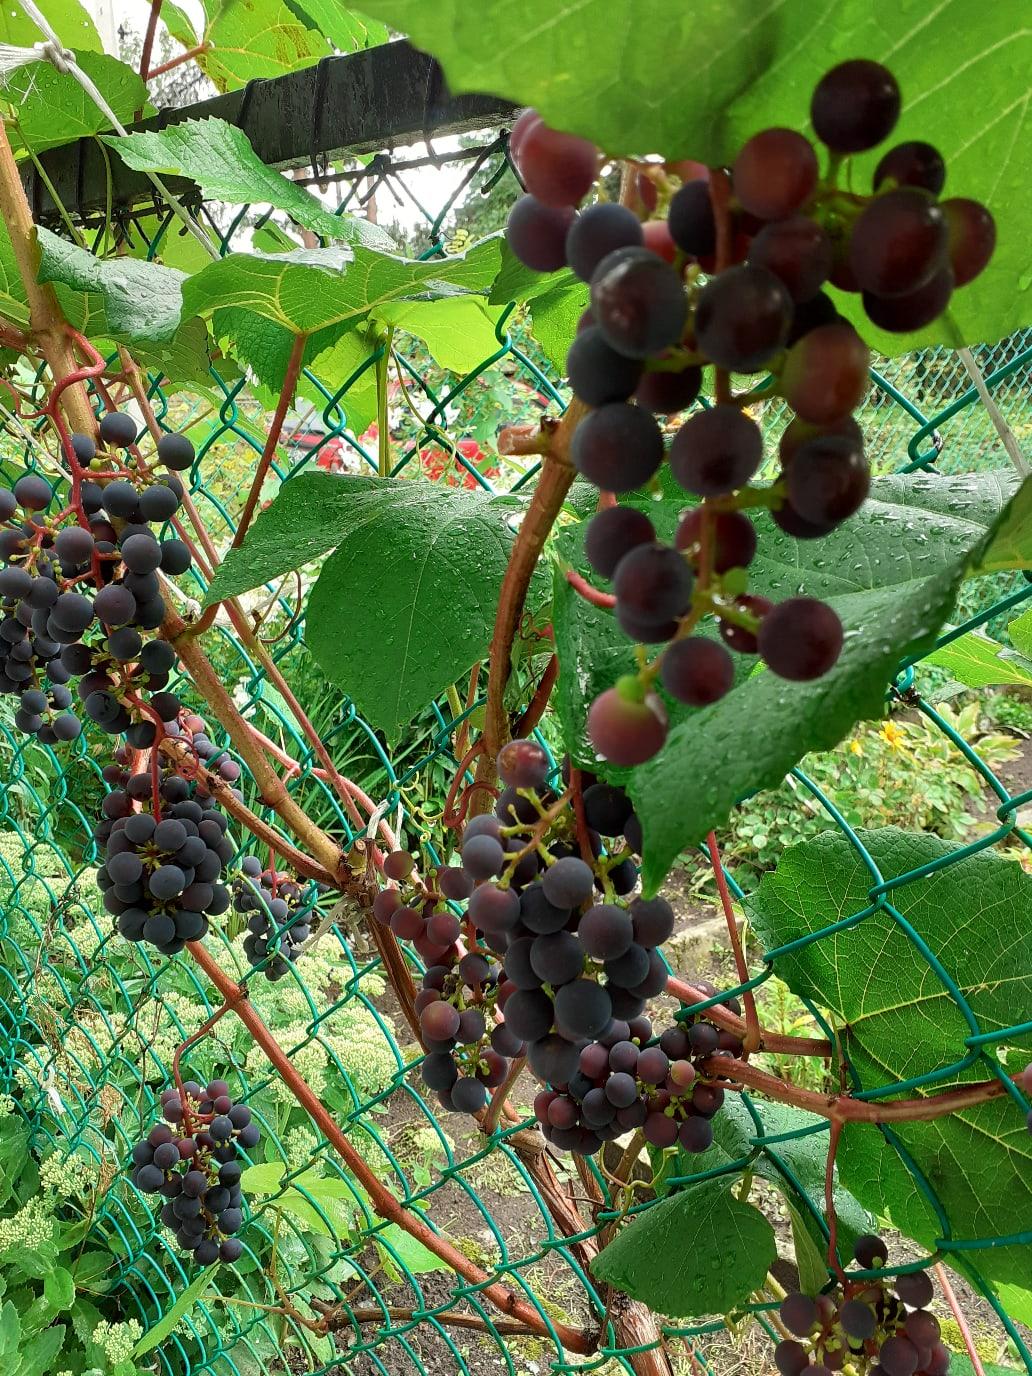 А у нас вот такой виноград на даче.